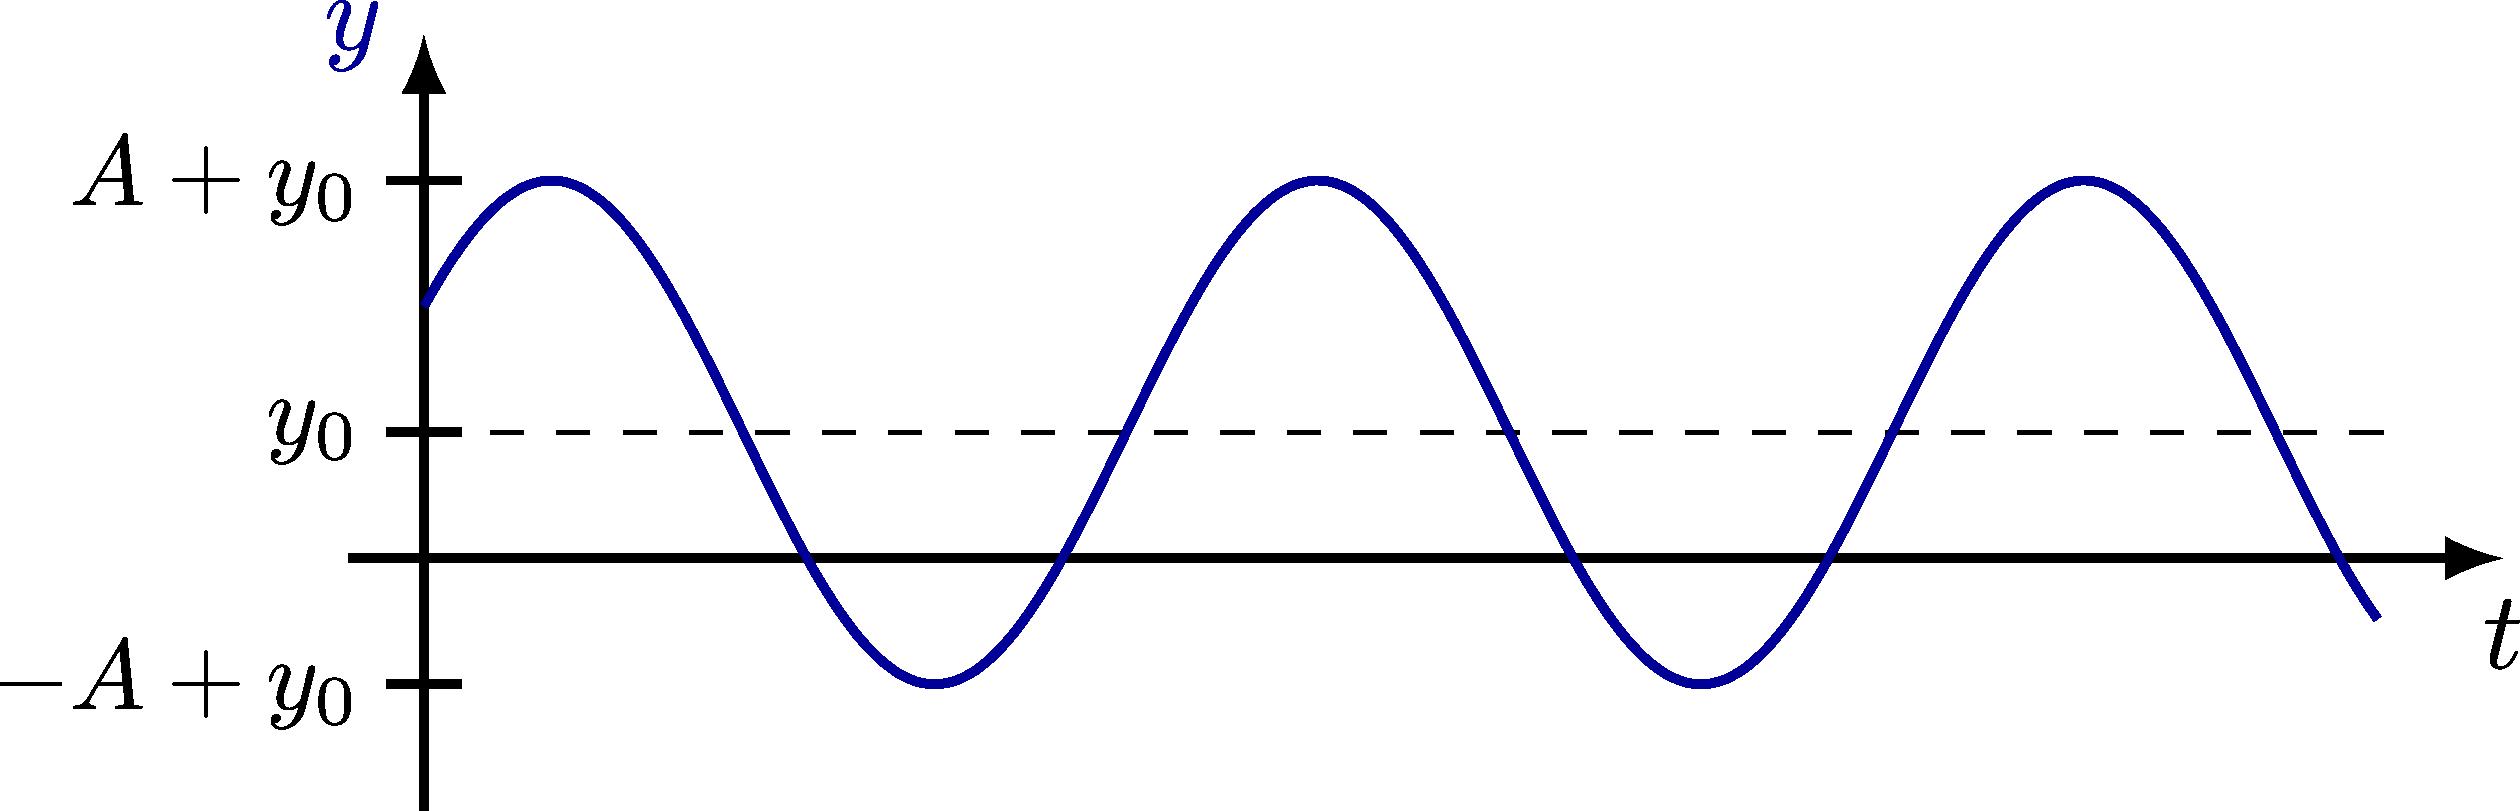 dynamics_oscillator-005.png